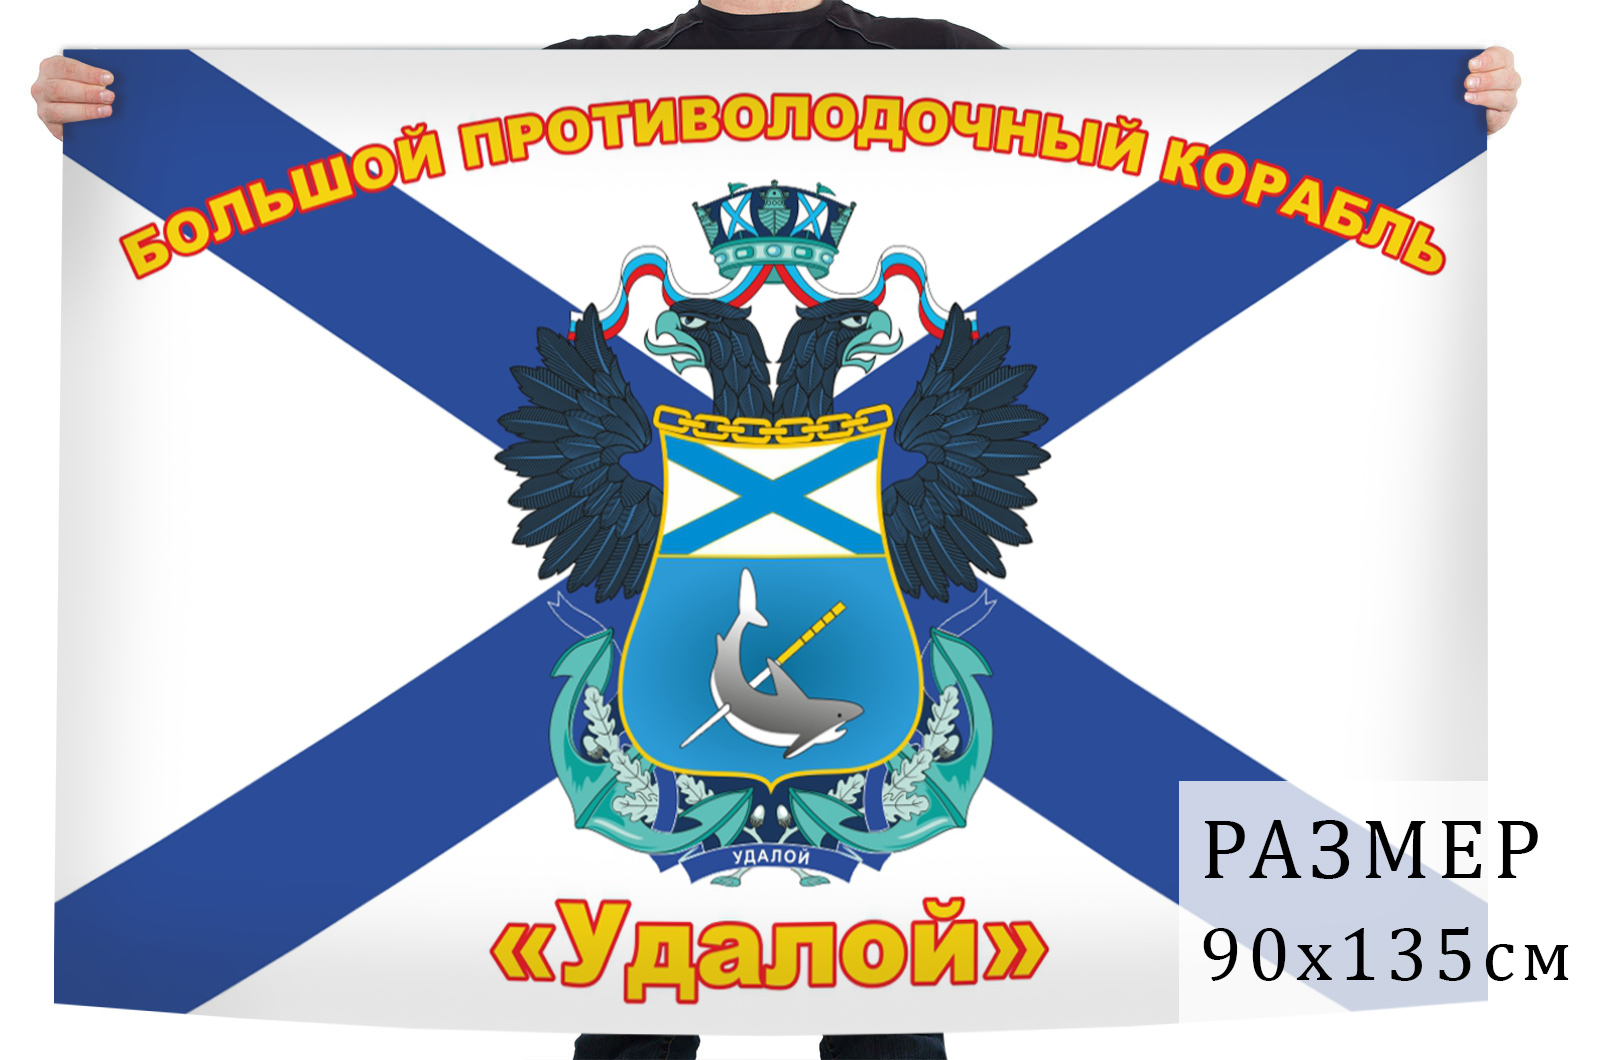 Флаг Большой противолодочный корабль Удалой